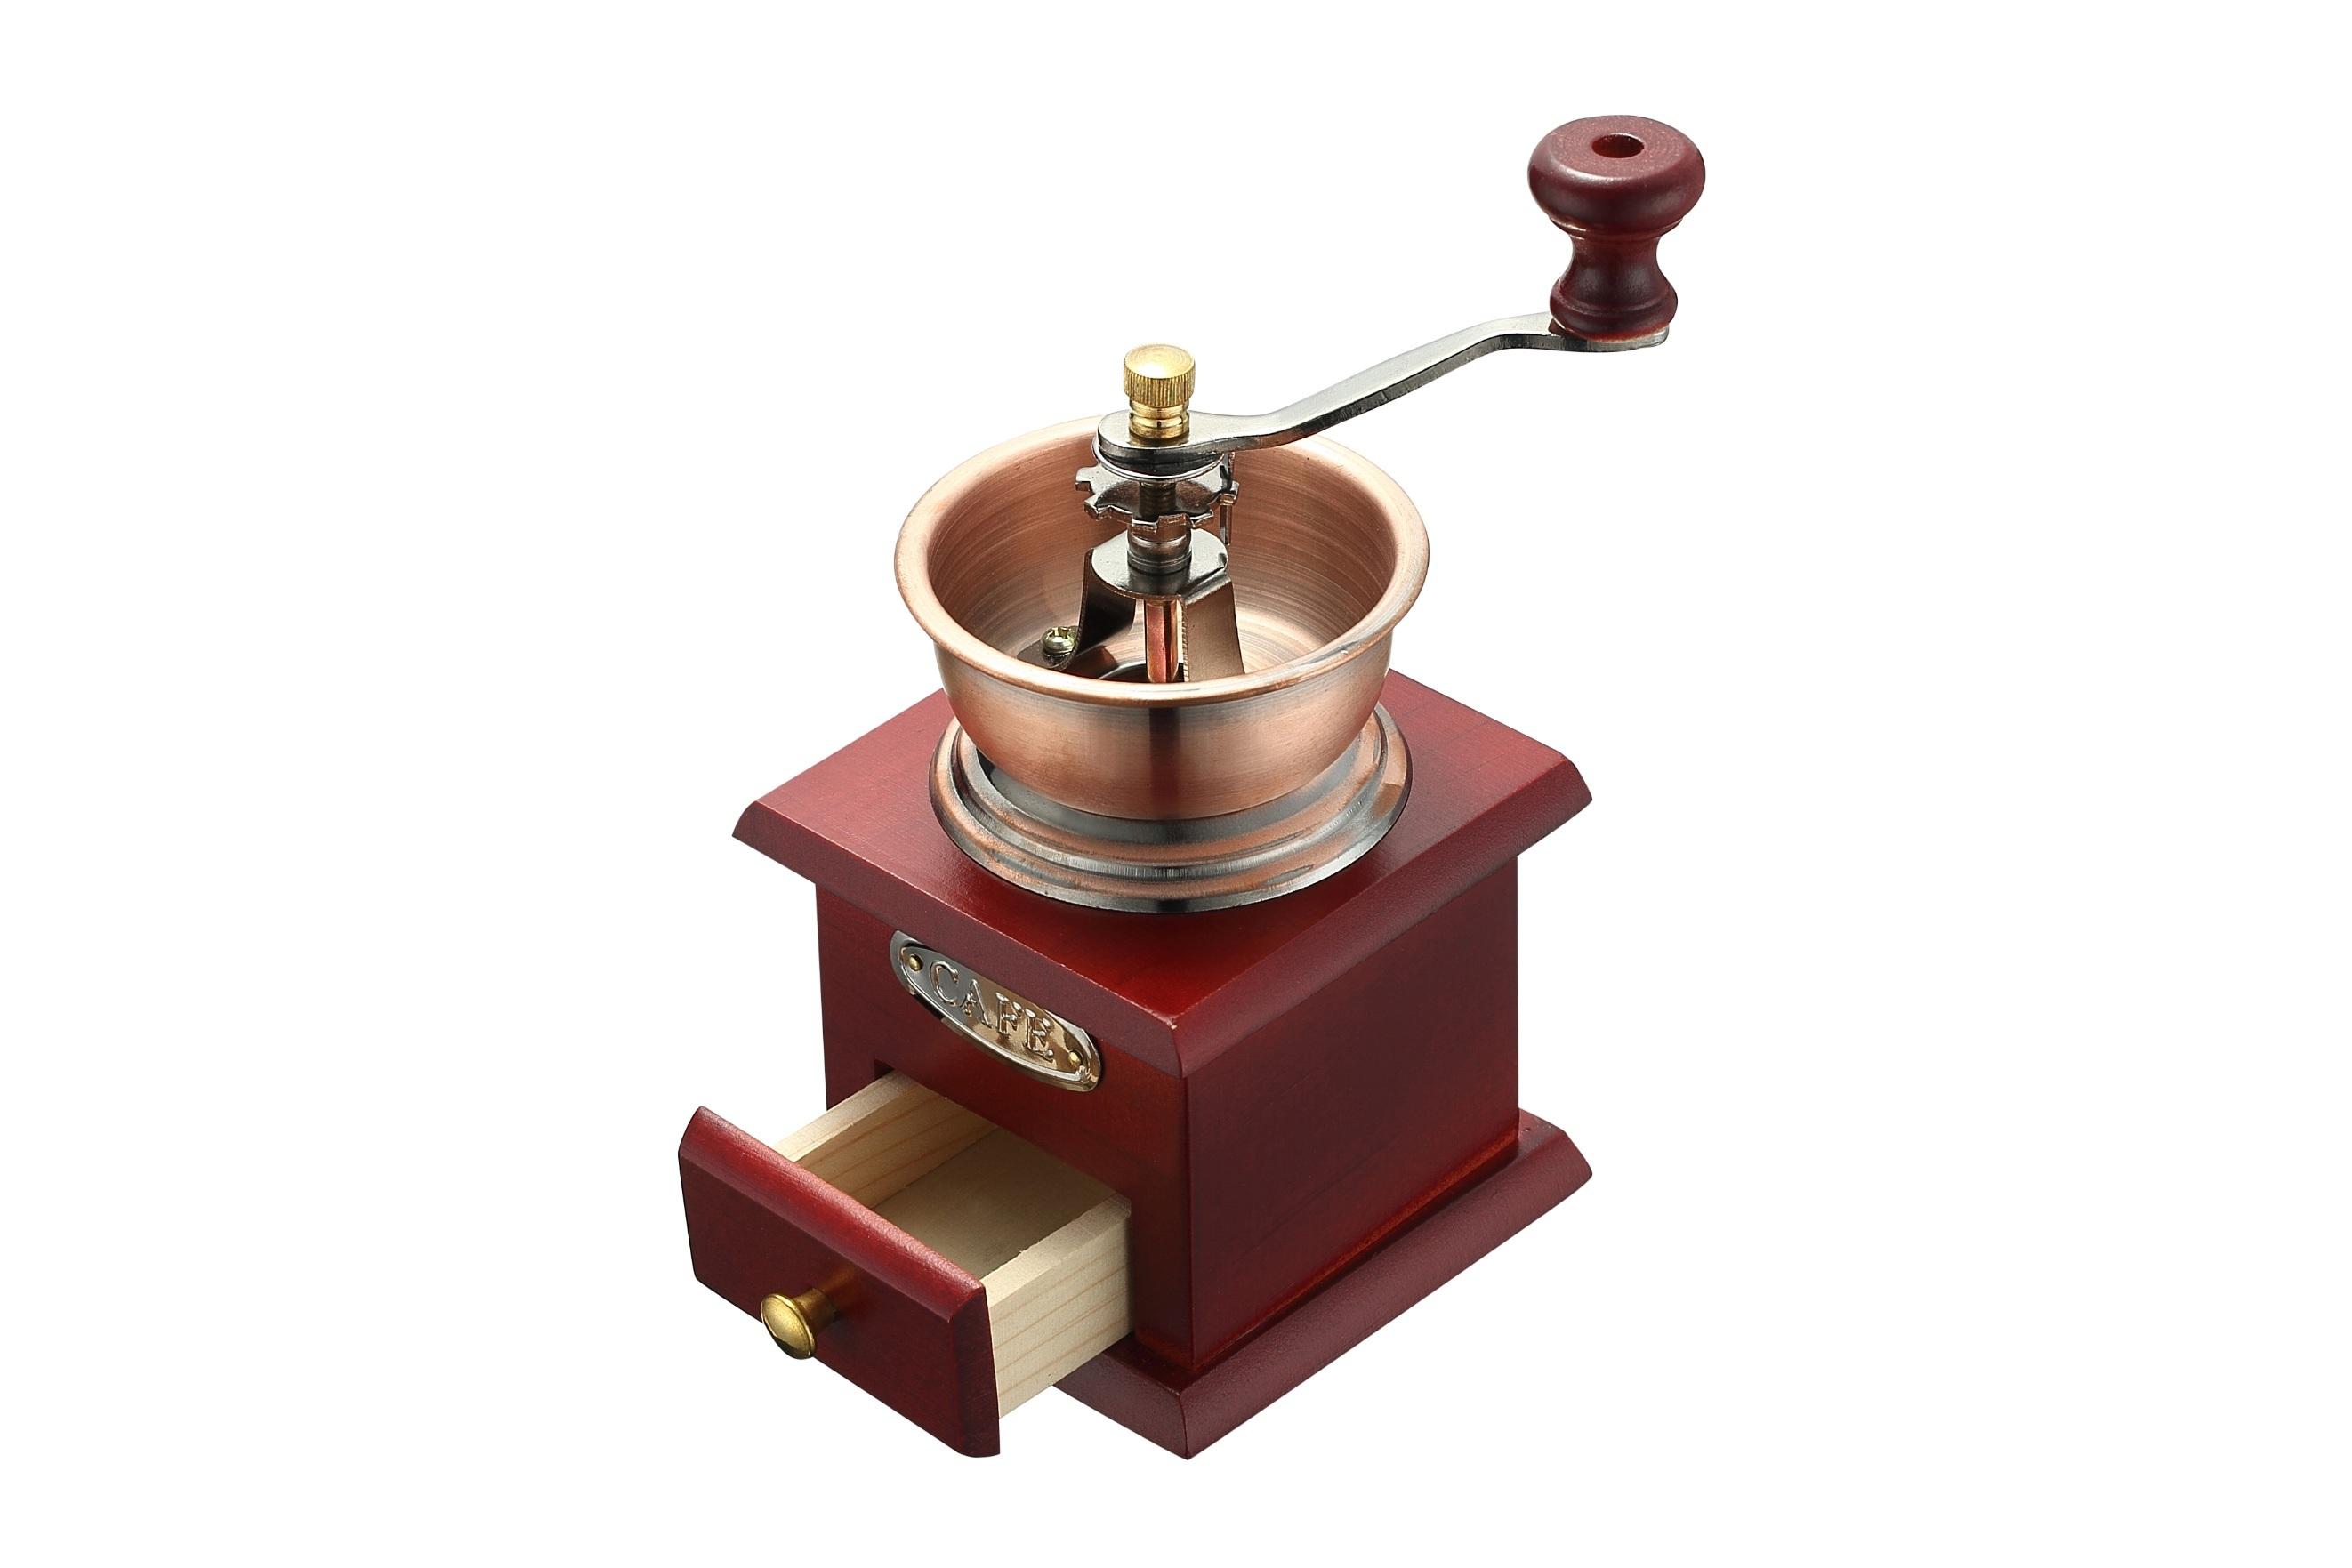 Zassenhaus Brasilia Homeware Grinding Coffee Mill